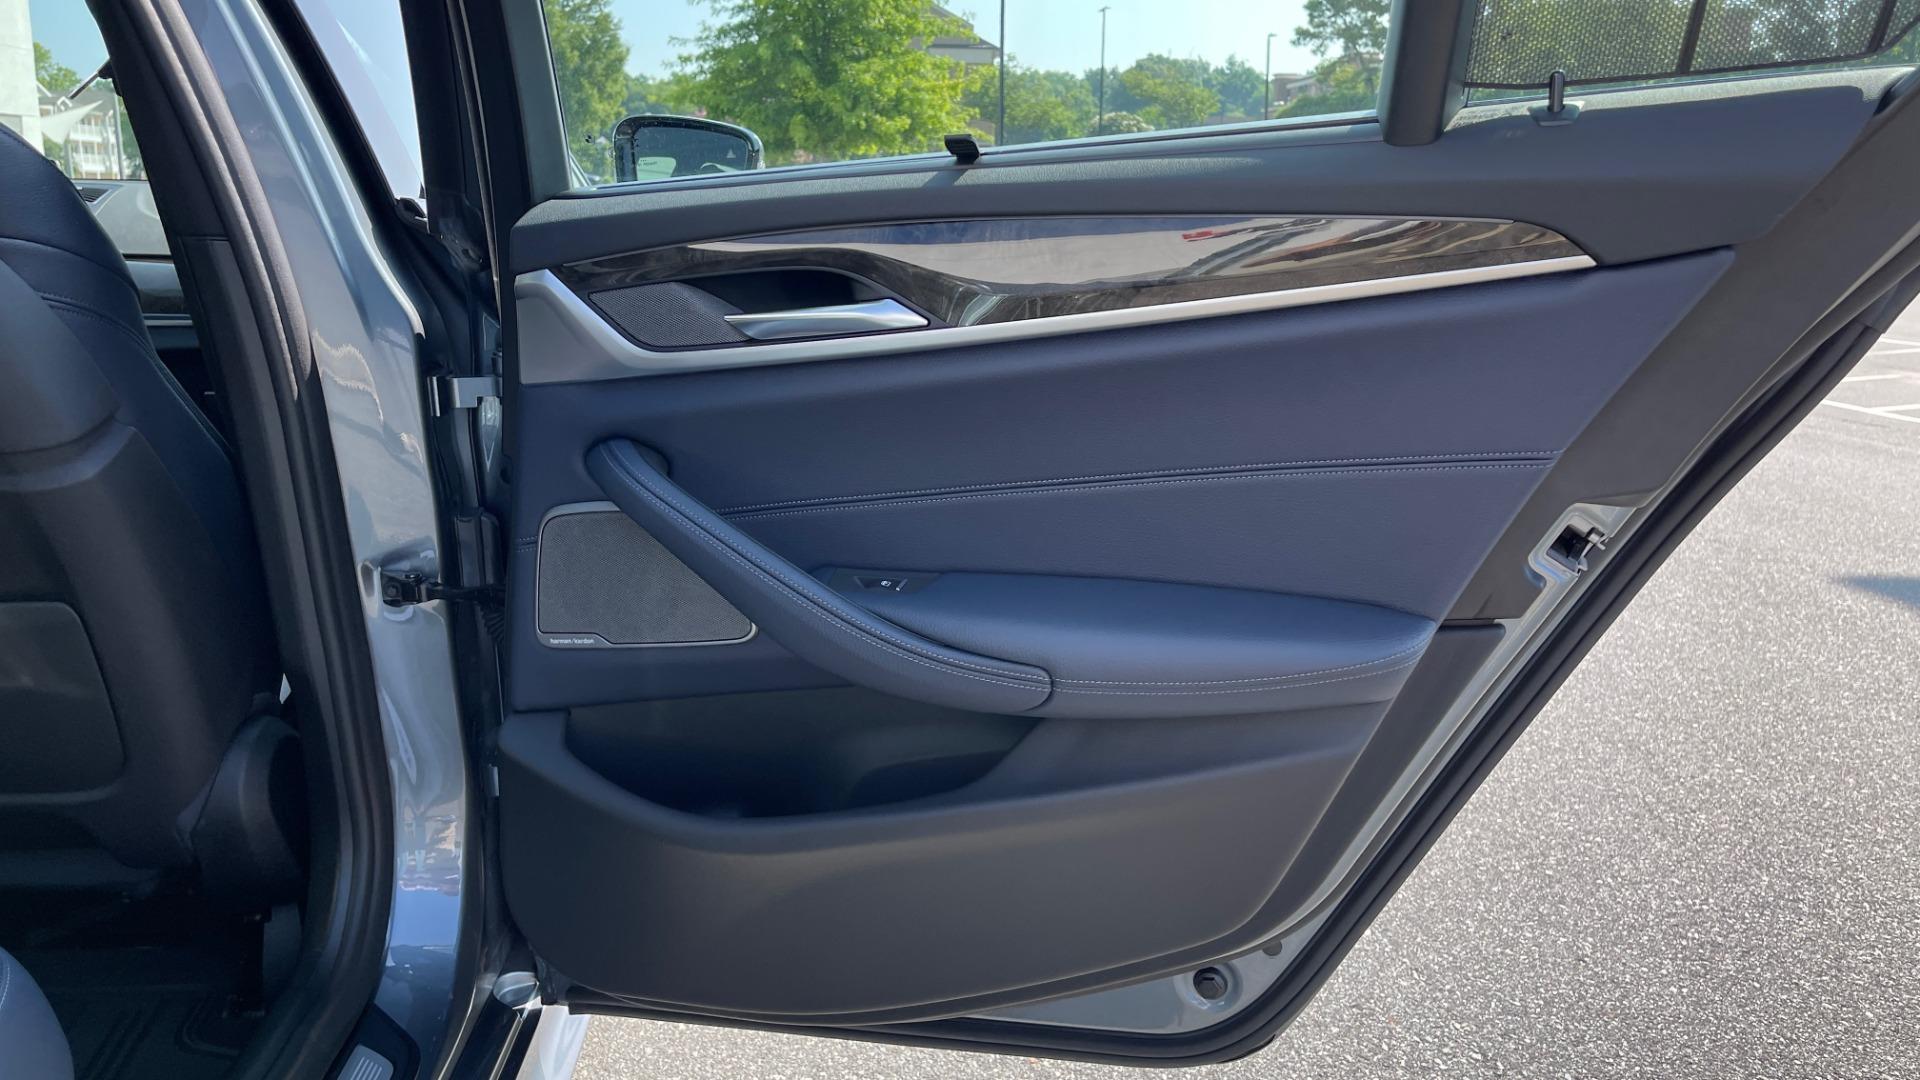 Used 2018 BMW 5 SERIES 540I XDRIVE M-SPORT / DRVR ASST / PDC / APPLE / HUD / H/K SND for sale $42,795 at Formula Imports in Charlotte NC 28227 58